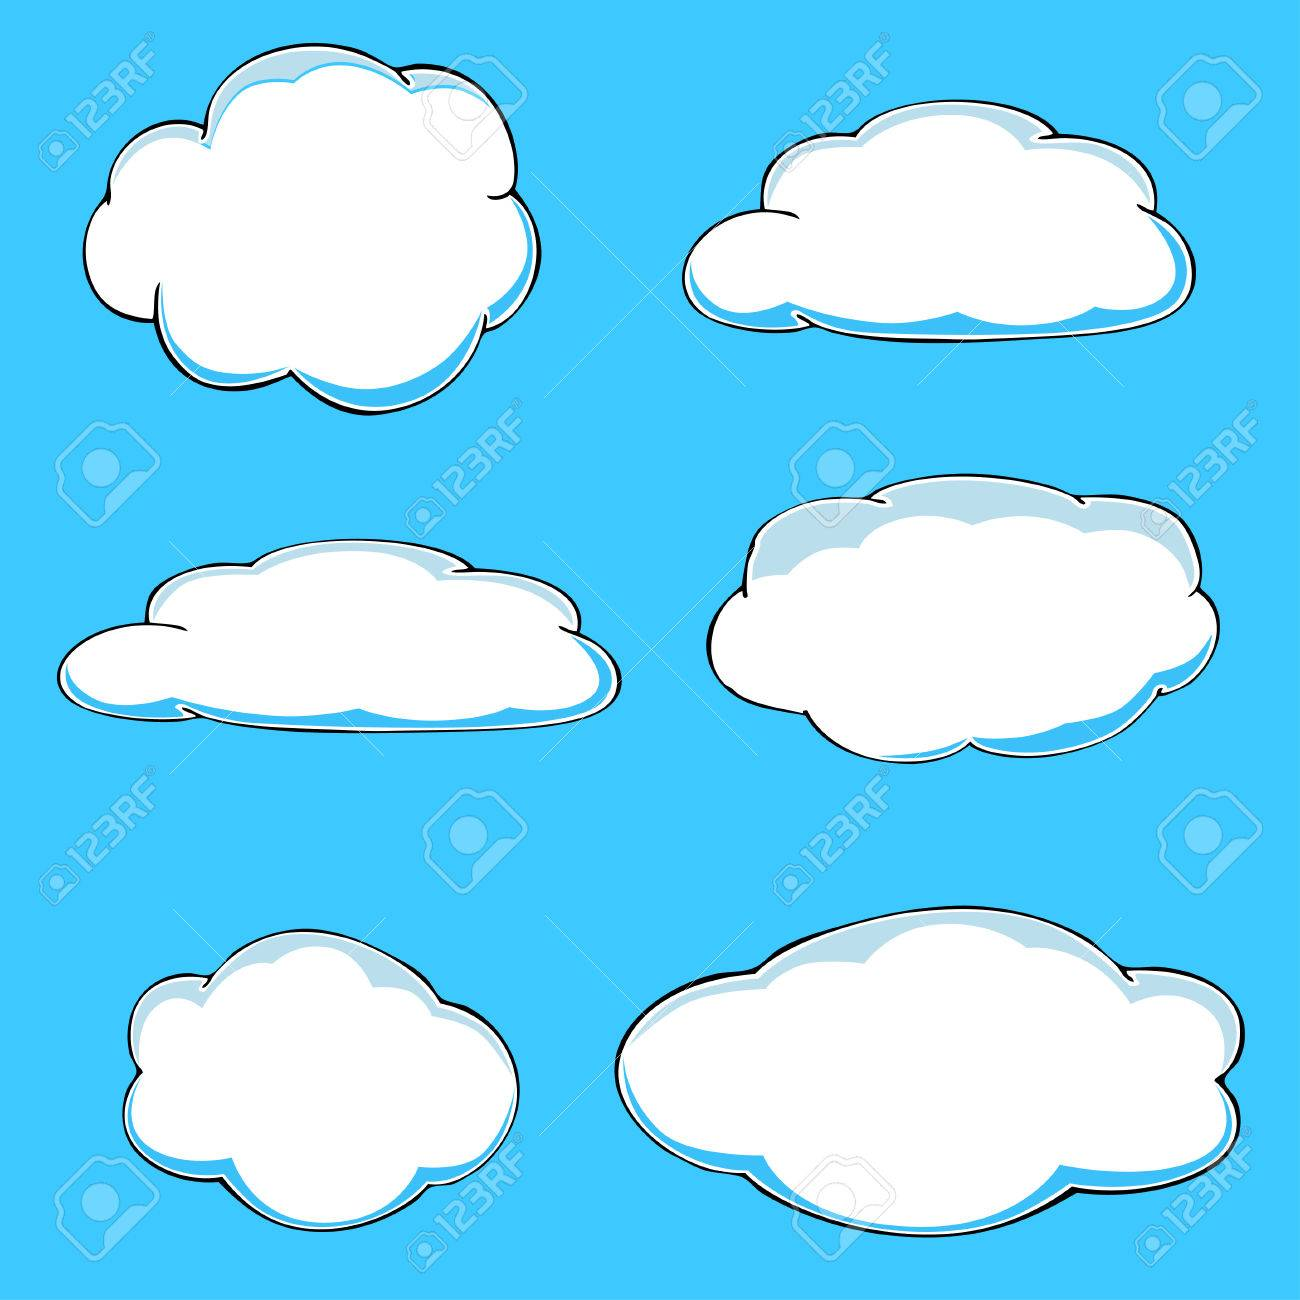 cartoon clouds illustration on blue background vector royalty free rh 123rf com cloud vector free cloud vectors free